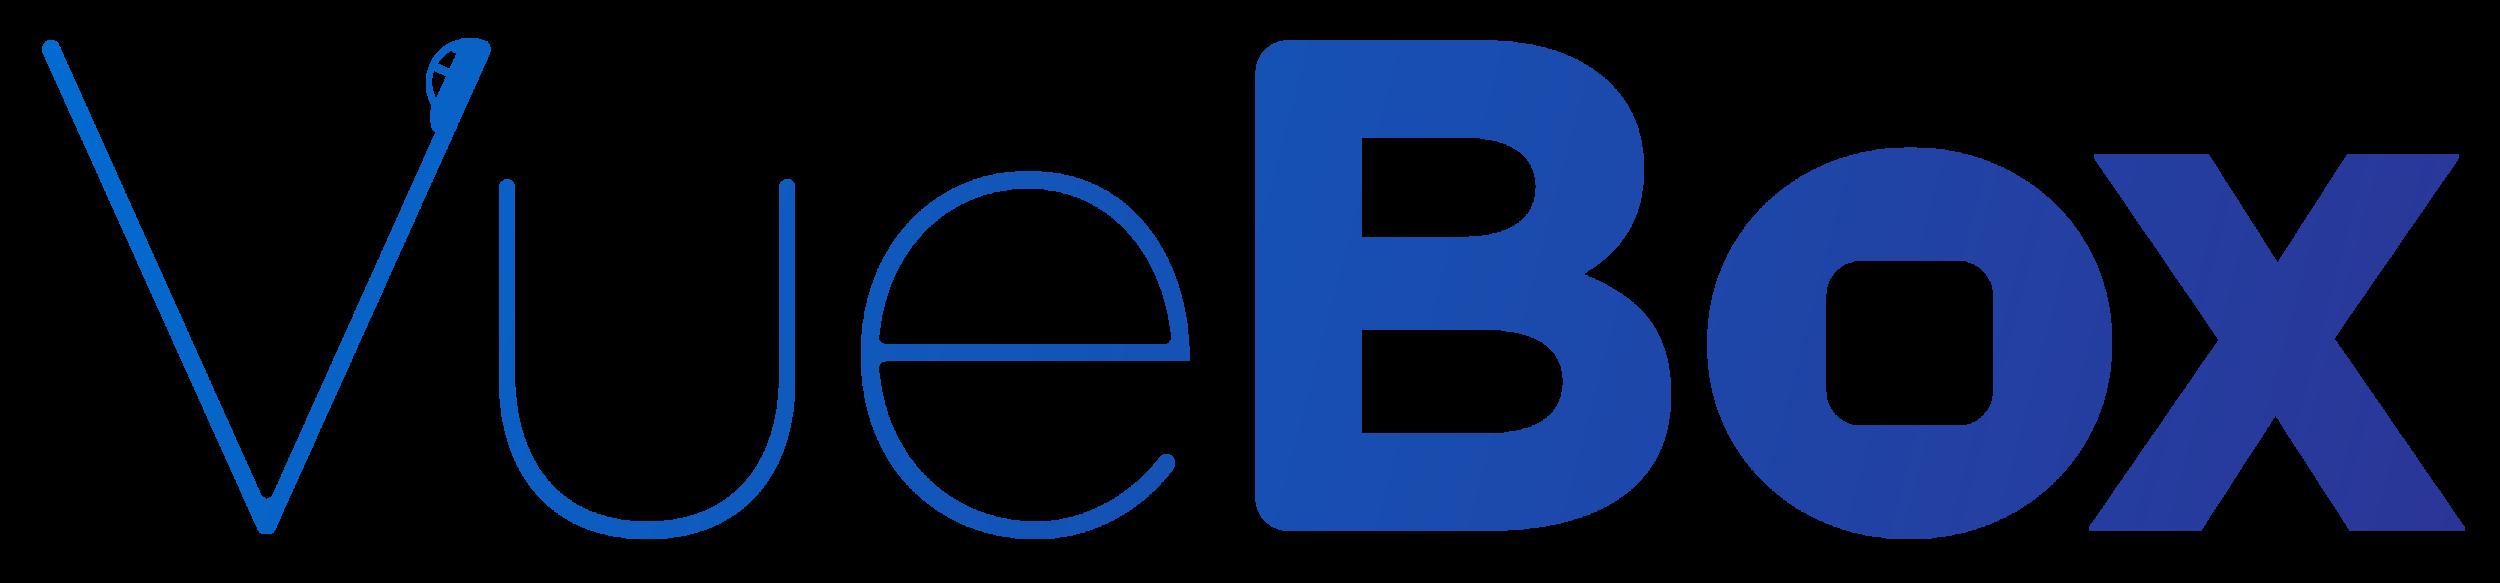 Vue Box Logo Final-04.png